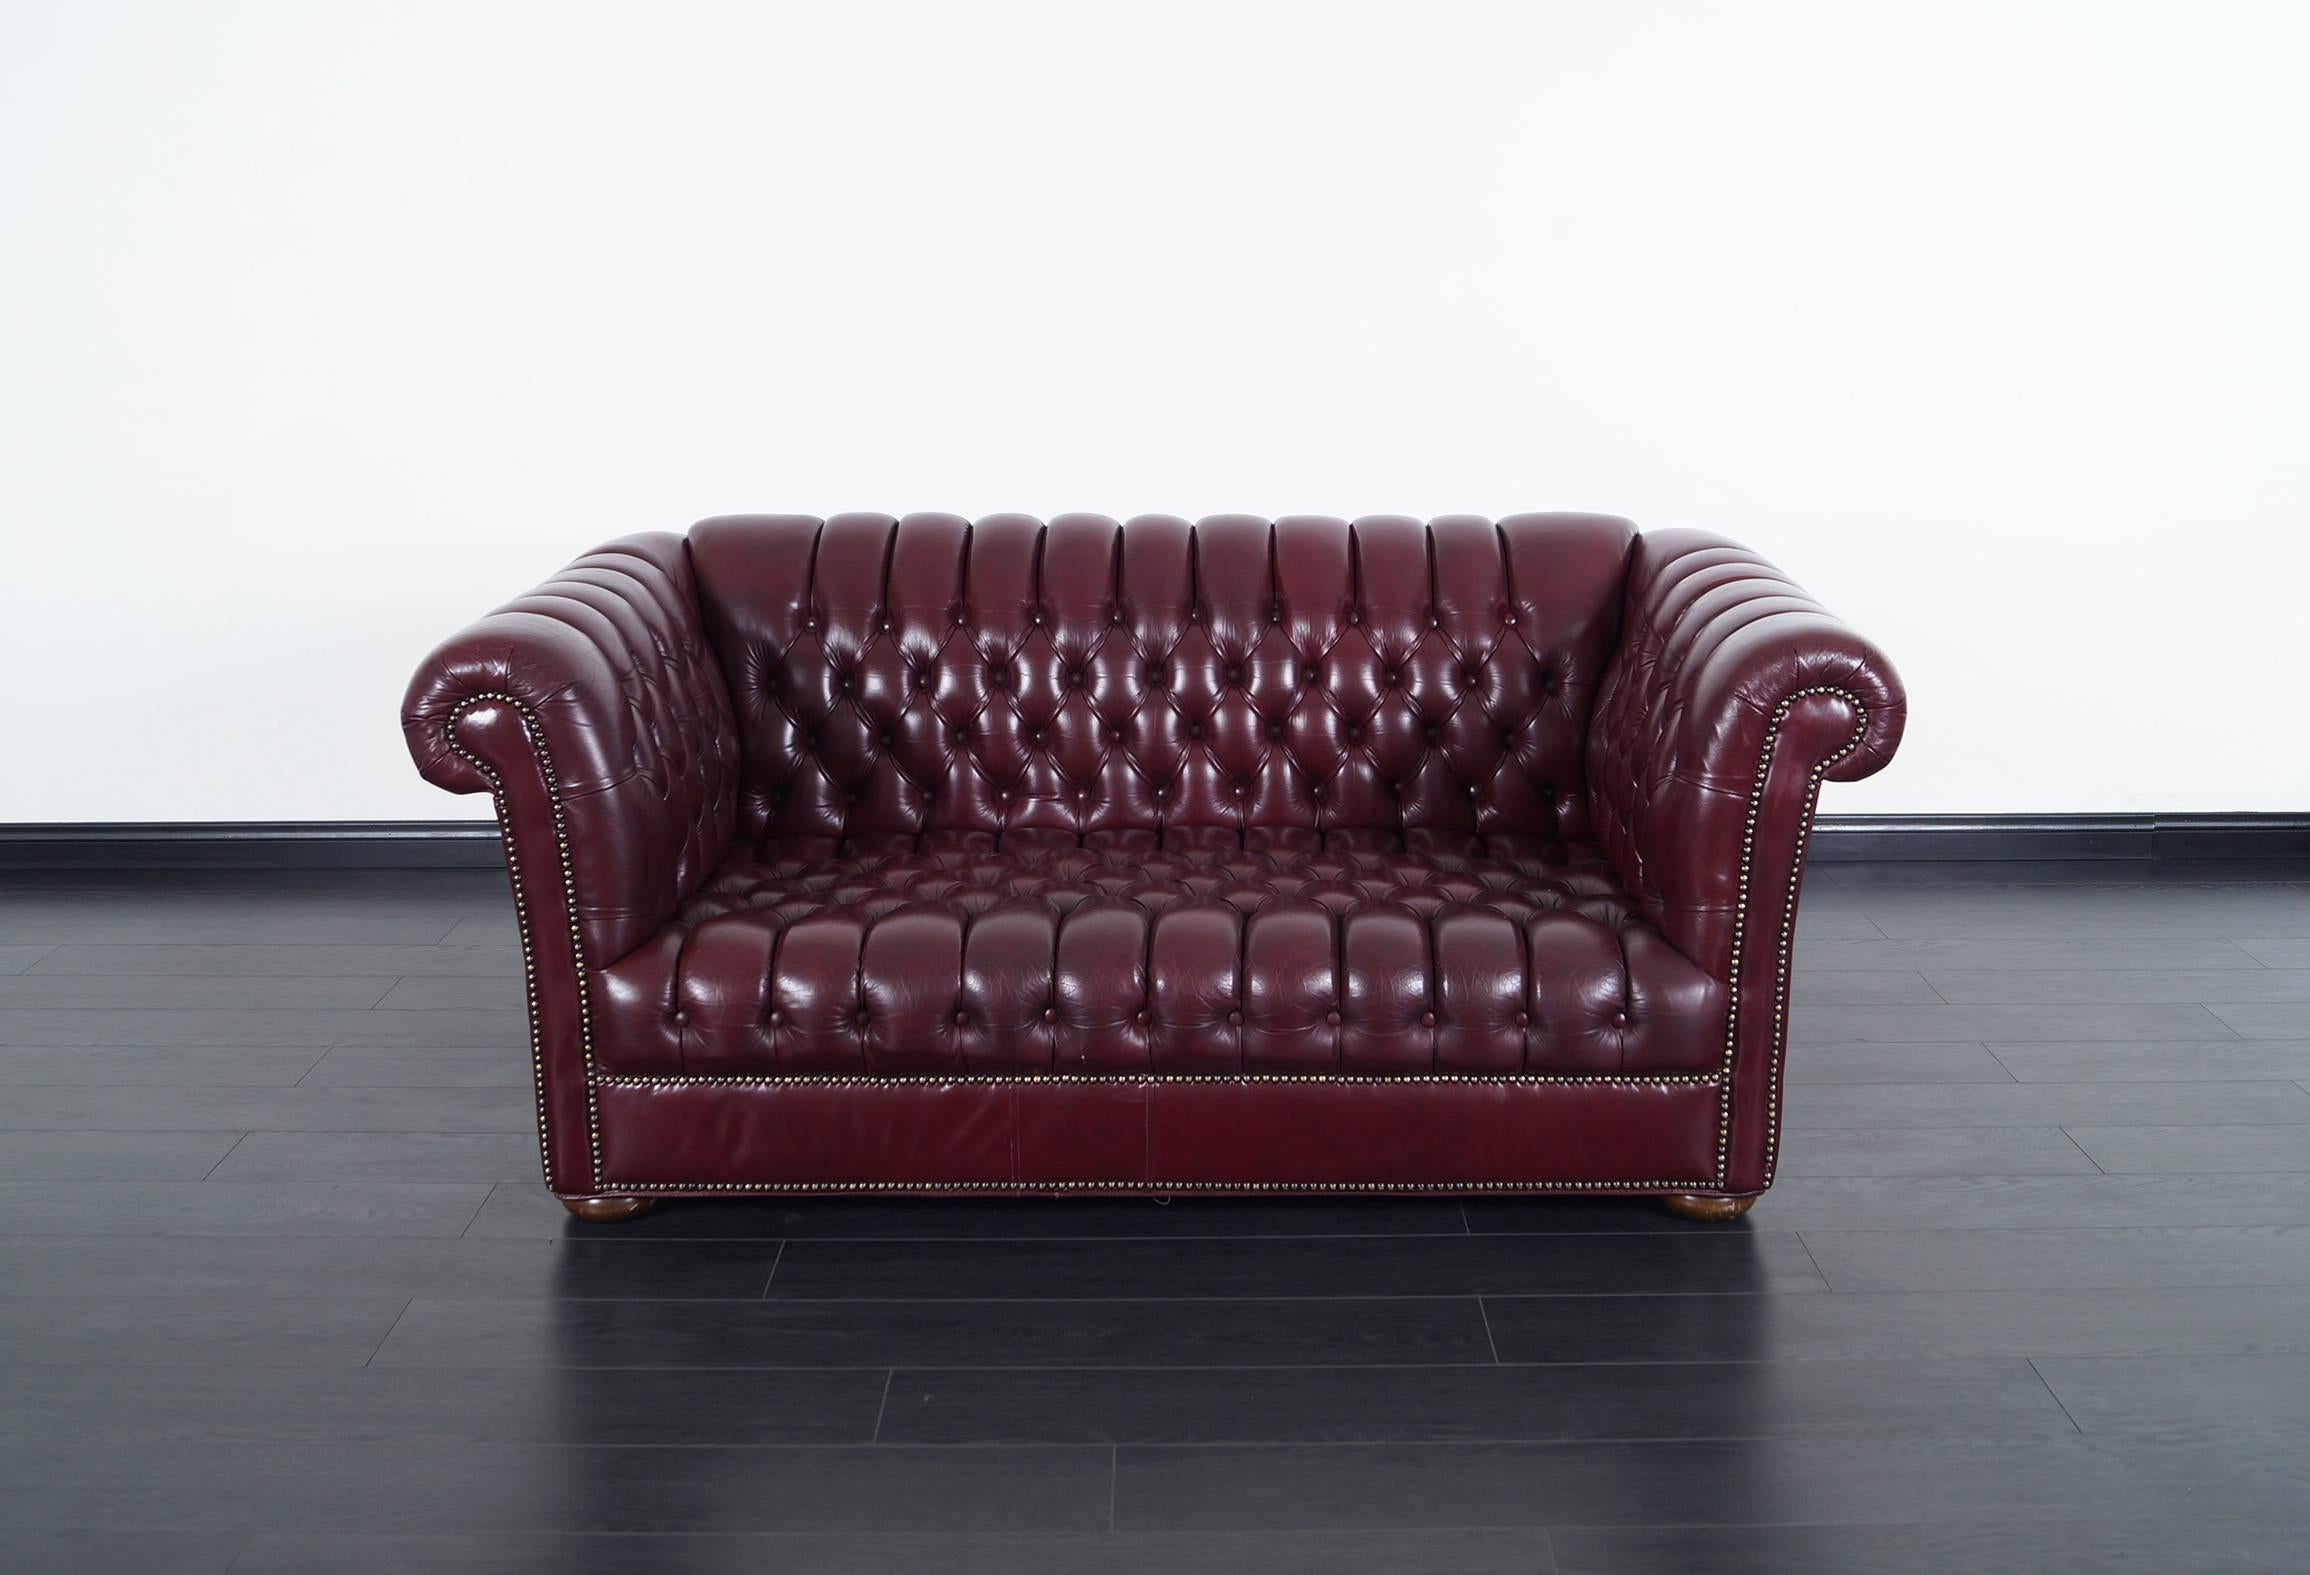 Enjoyable Vintage Burgundy Leather Chesterfield Loveseat Forskolin Free Trial Chair Design Images Forskolin Free Trialorg